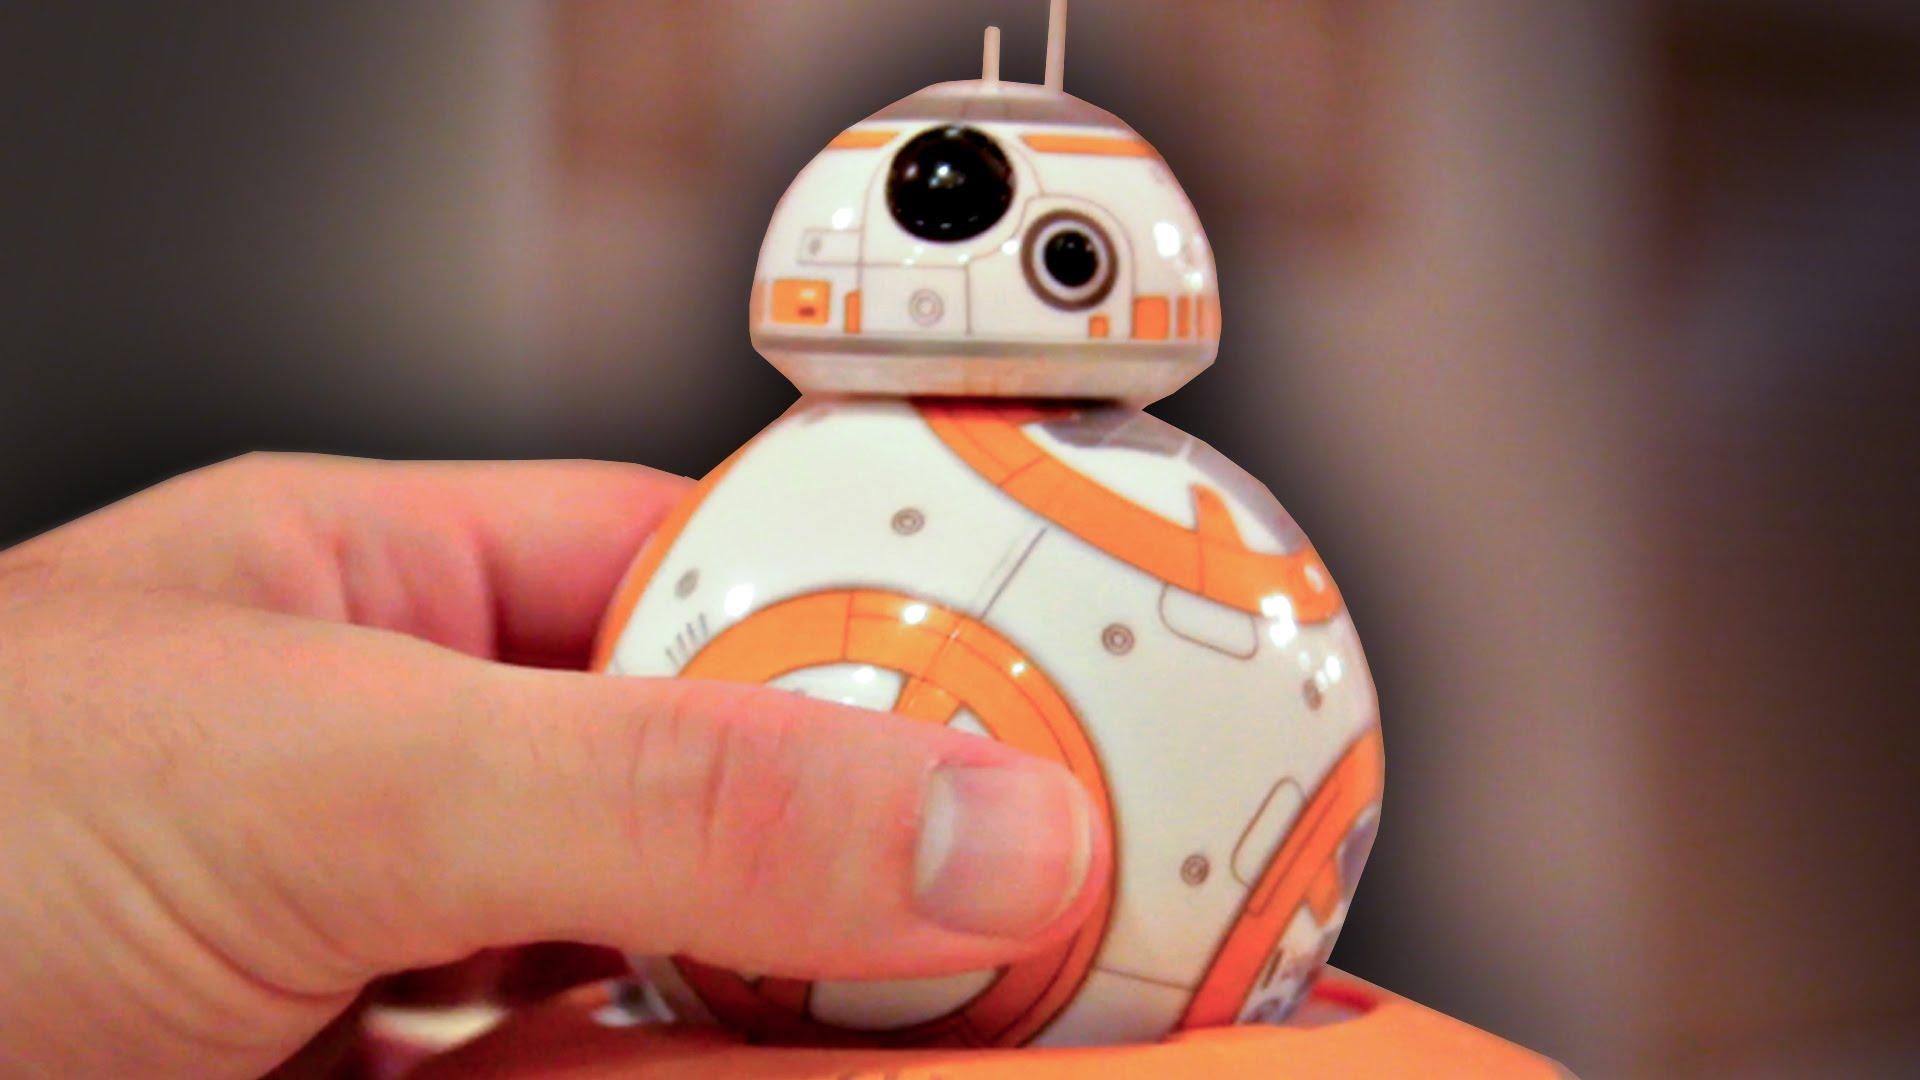 Star Wars Ball Drone Drone Hd Wallpaper Regimage Org